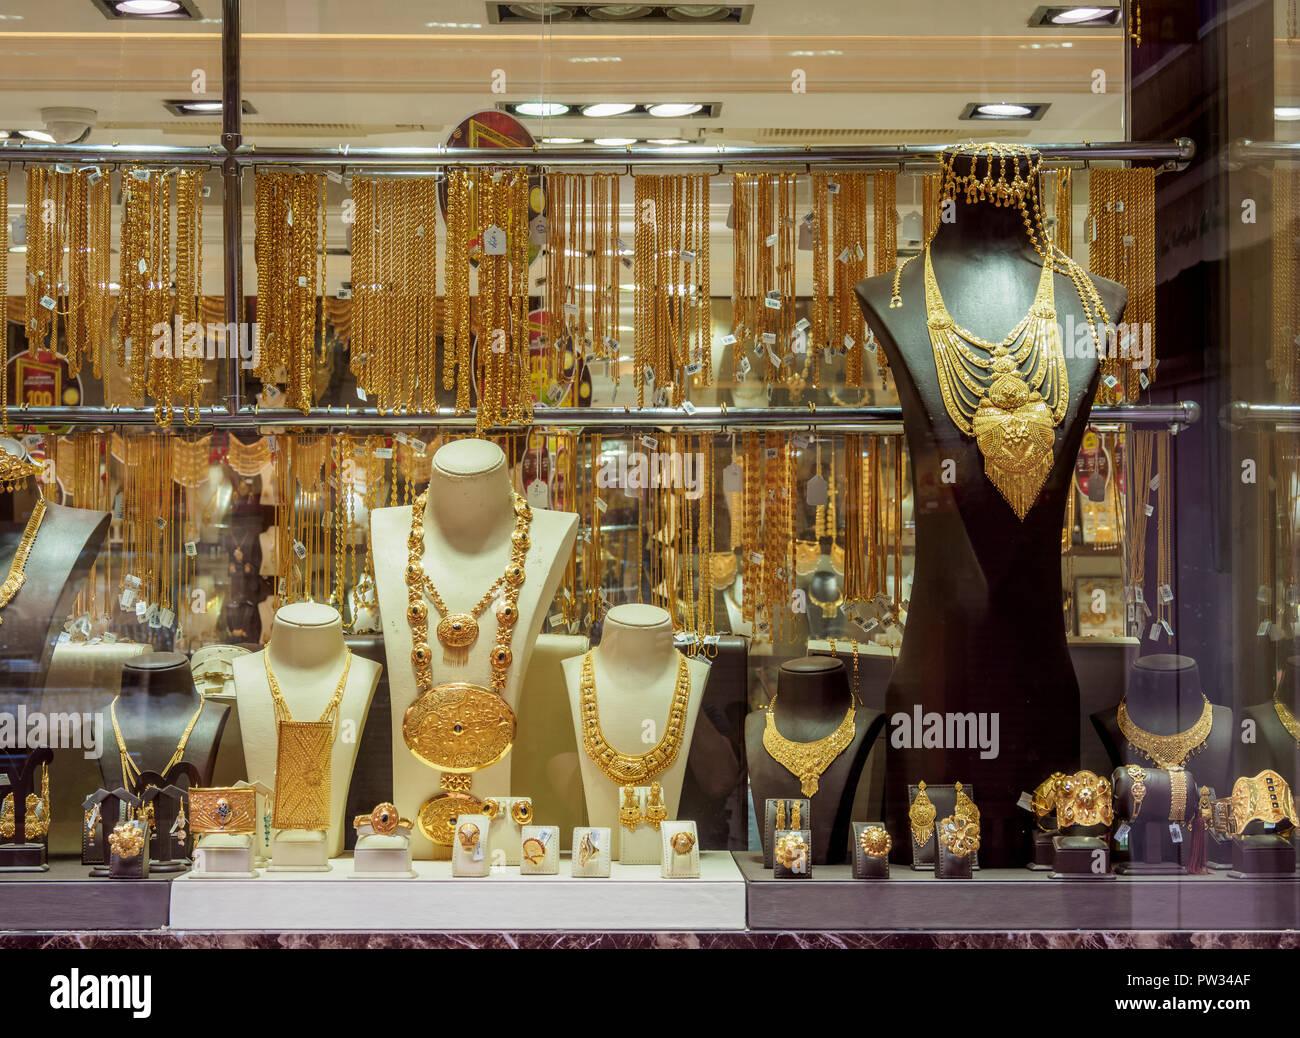 Arab Jewellery Stock Photos & Arab Jewellery Stock Images